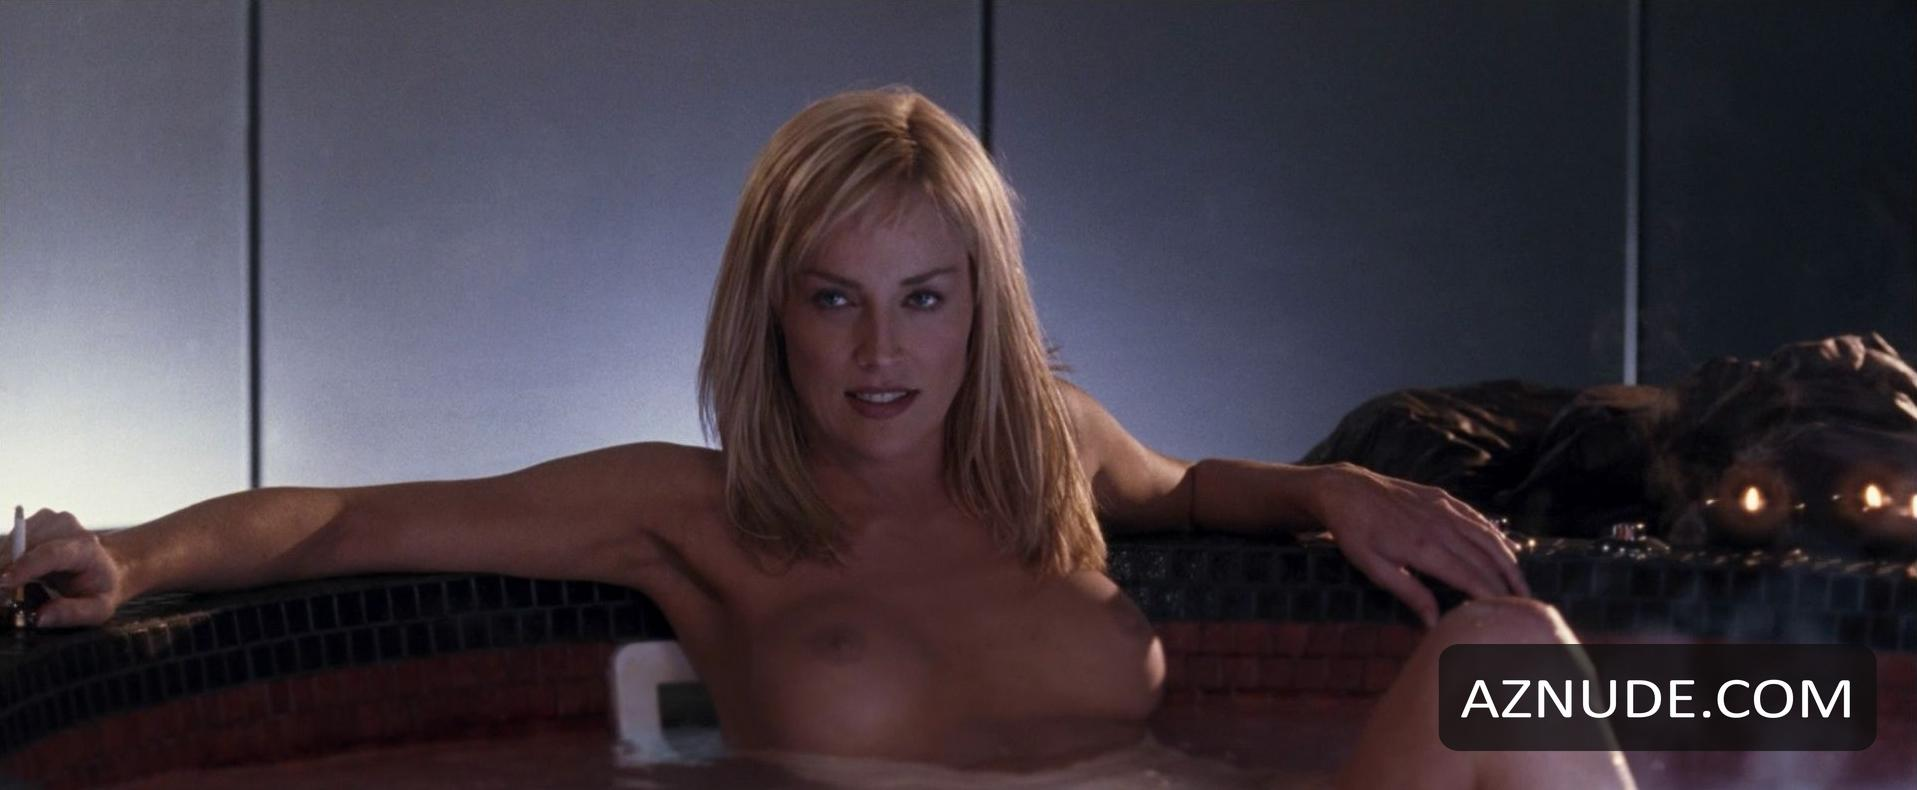 free lesbain domination videos